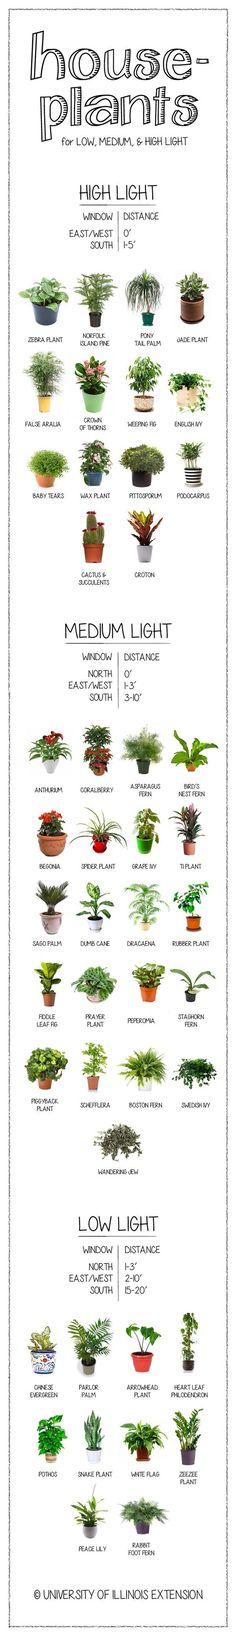 Interior Designs clipart garden cleaning Interiors details Home in Gardening